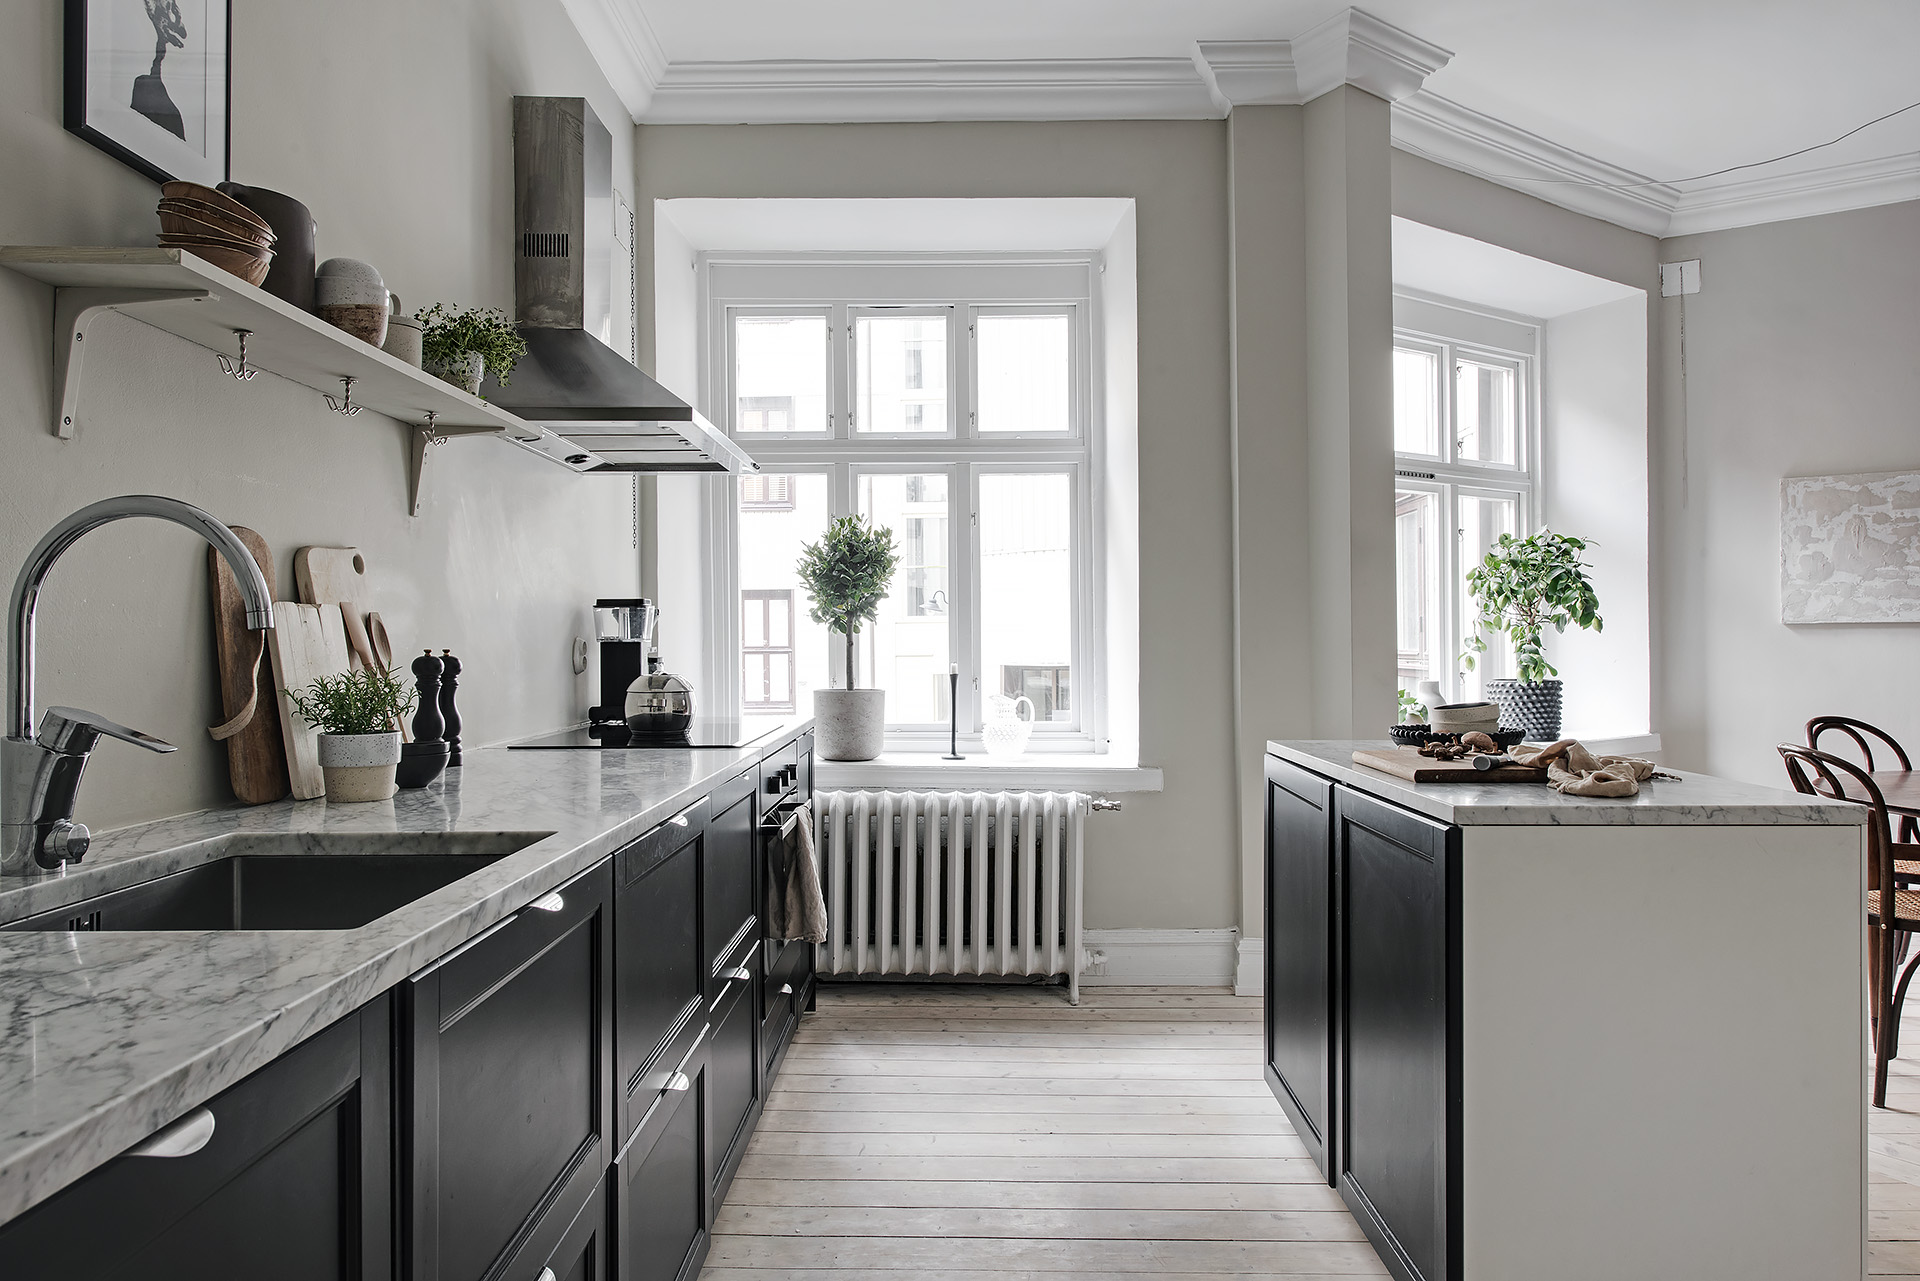 Stylish Home In Greige Coco Lapine Designcoco Lapine Design